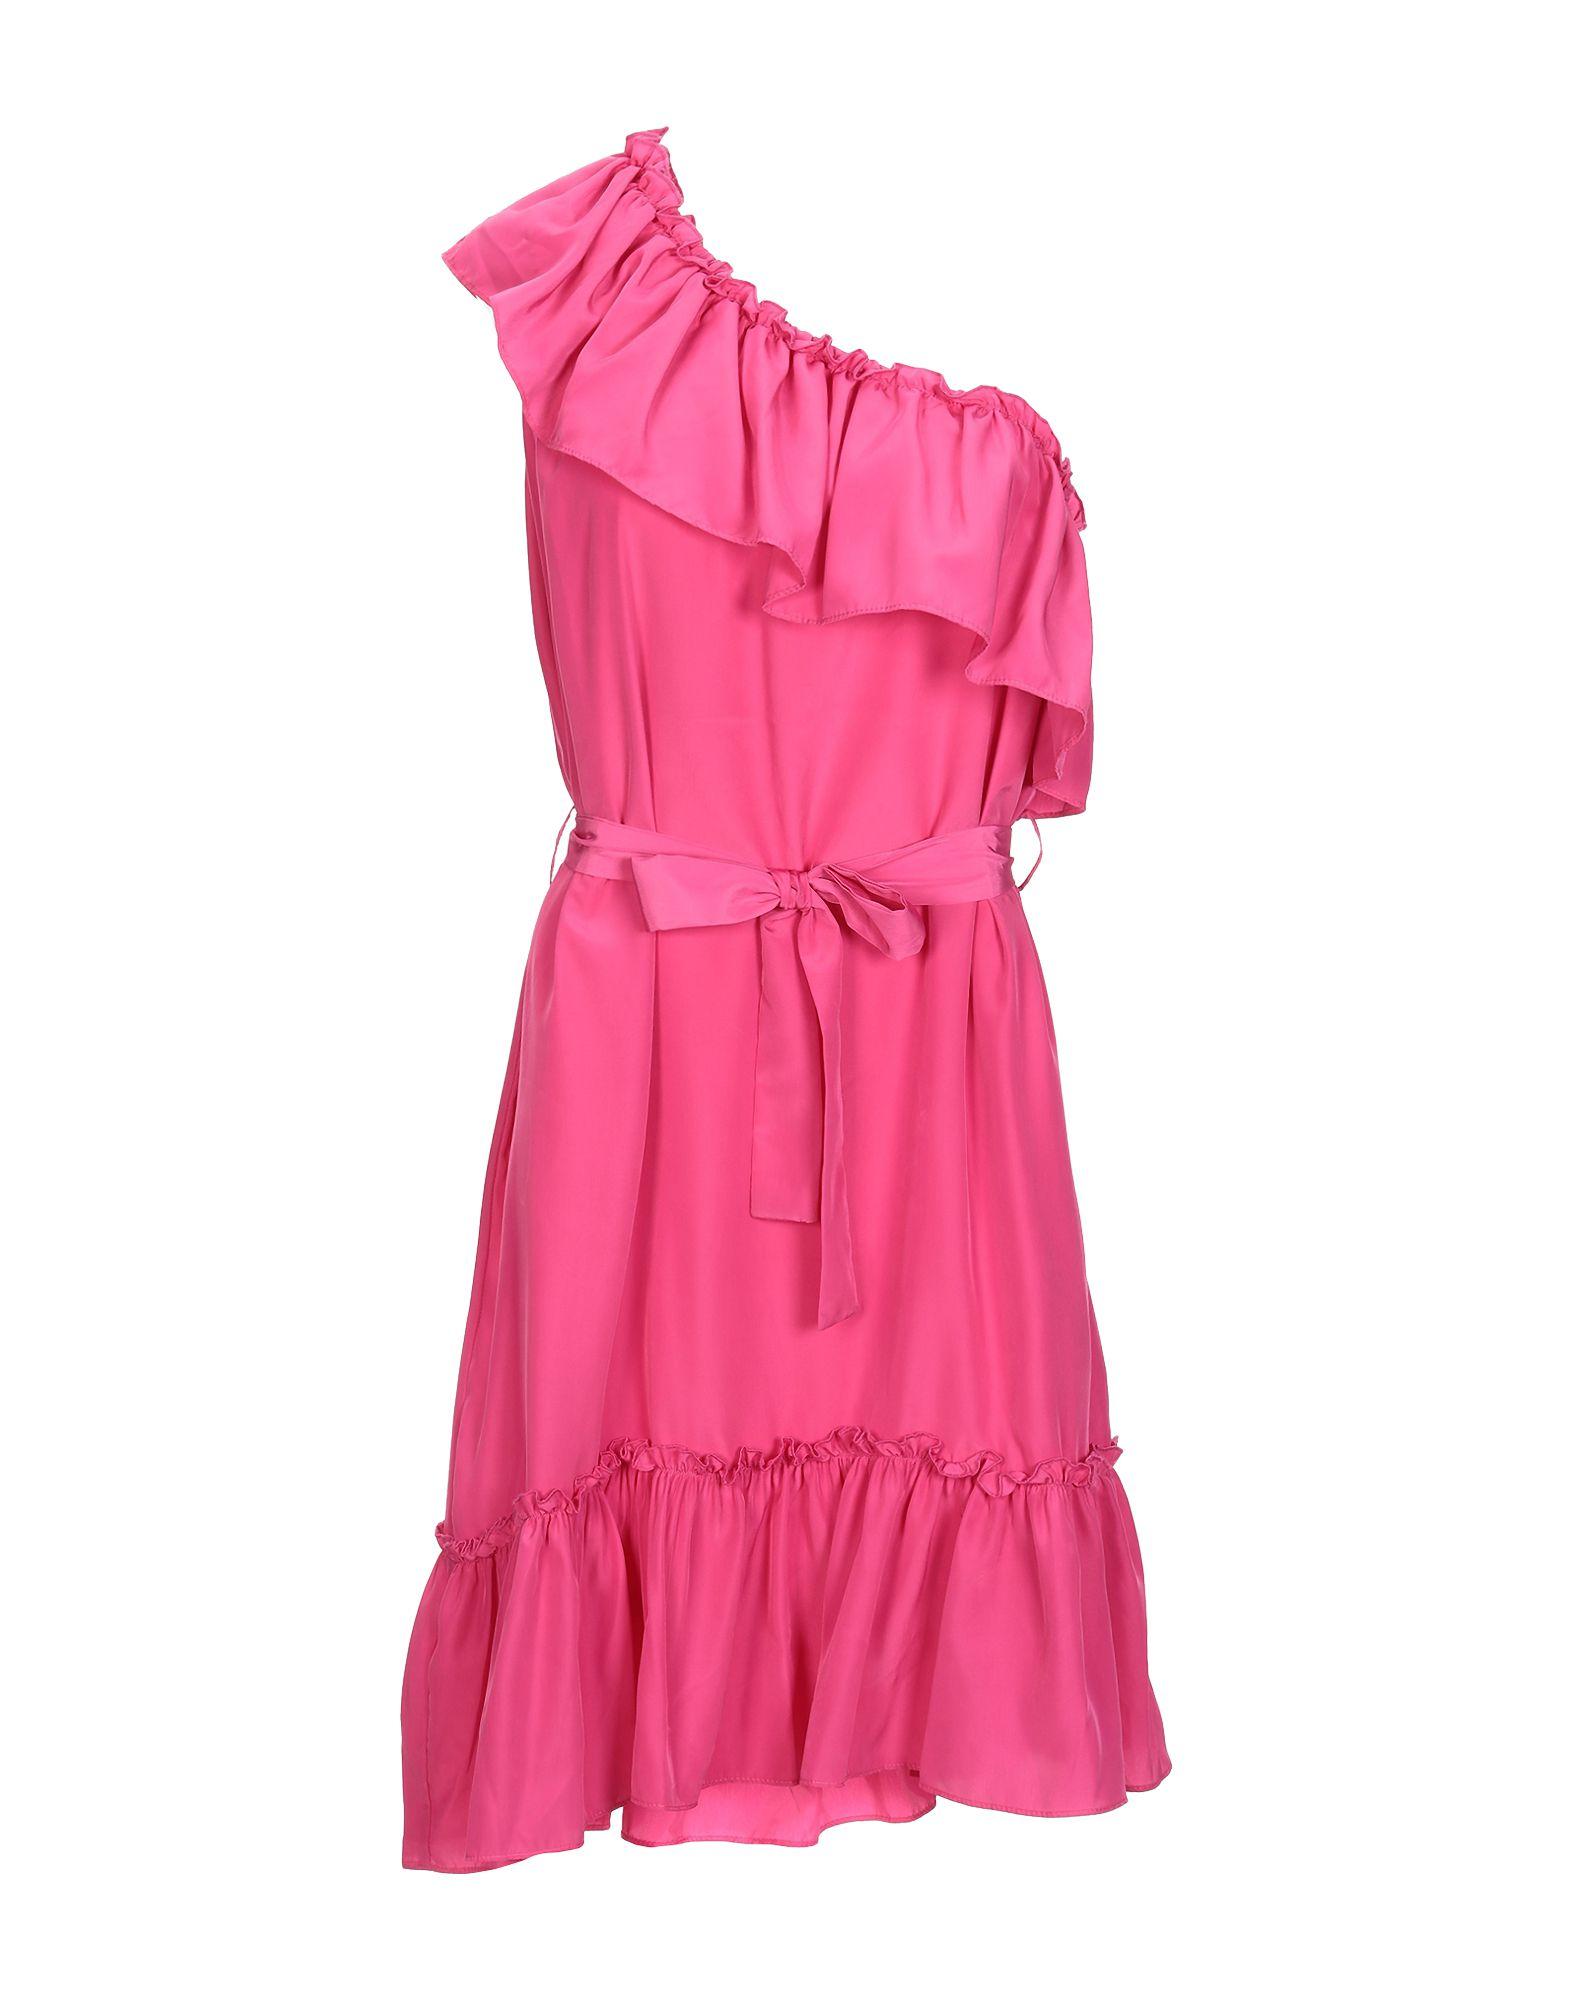 купить SH by SILVIAN HEACH Платье до колена